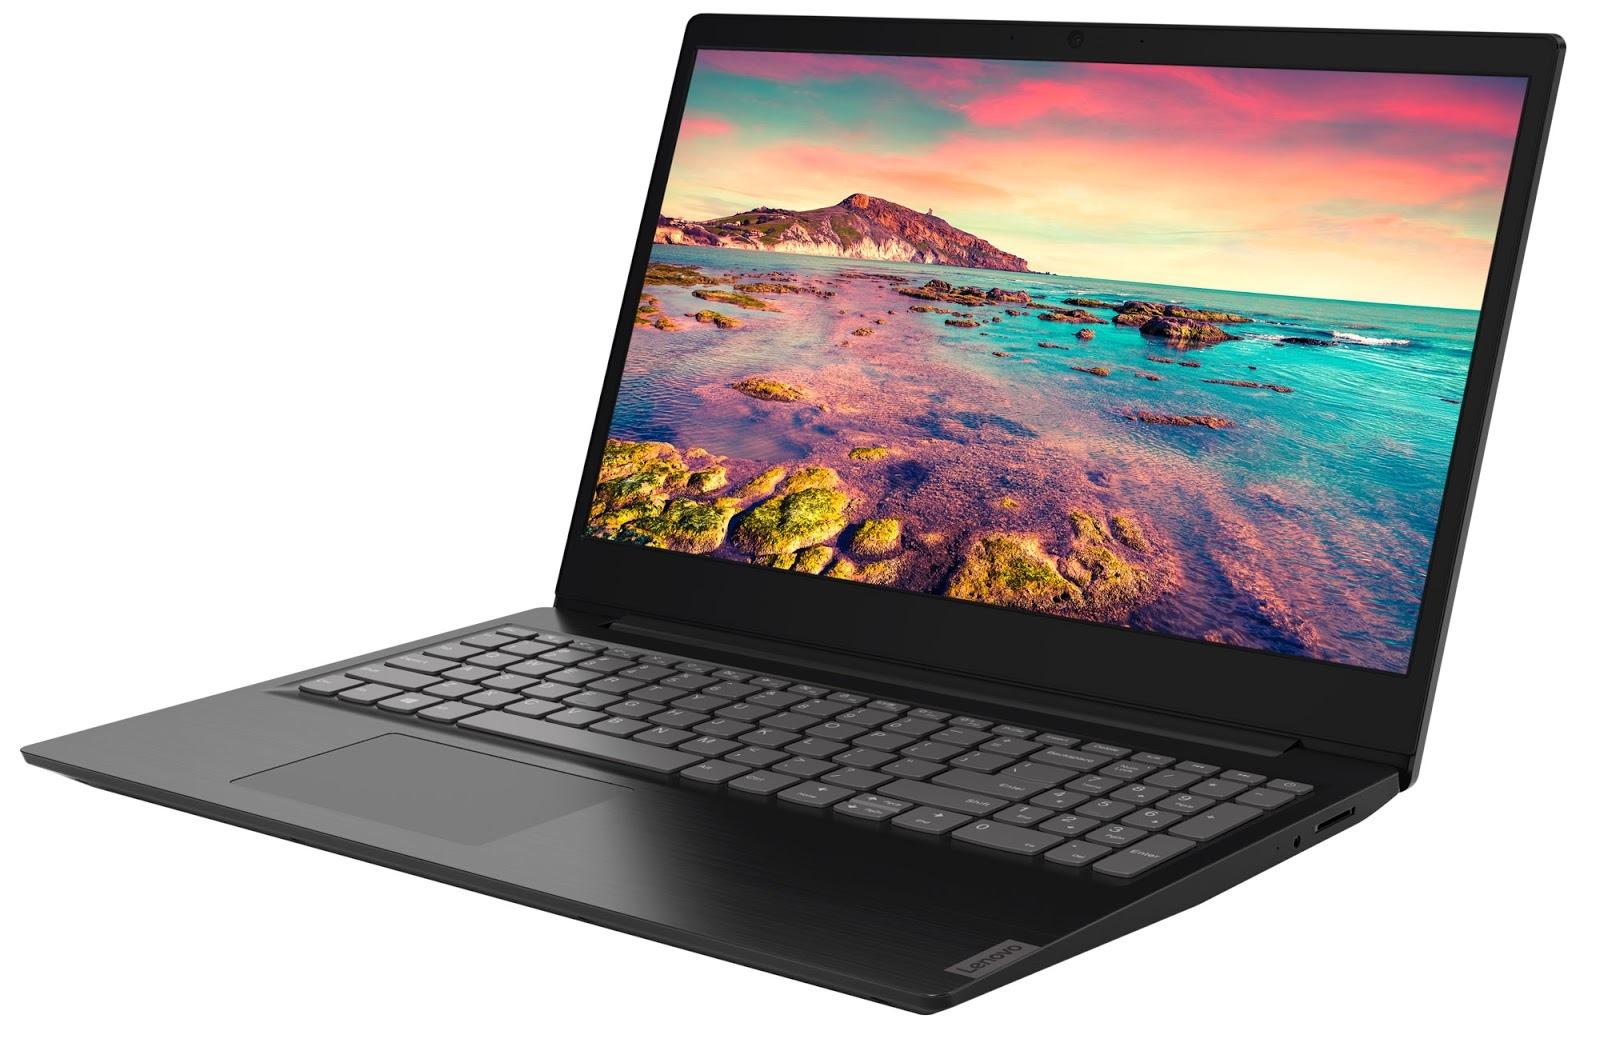 Фото 2. Ноутбук Lenovo ideapad S145-15AST (81N300BURE)